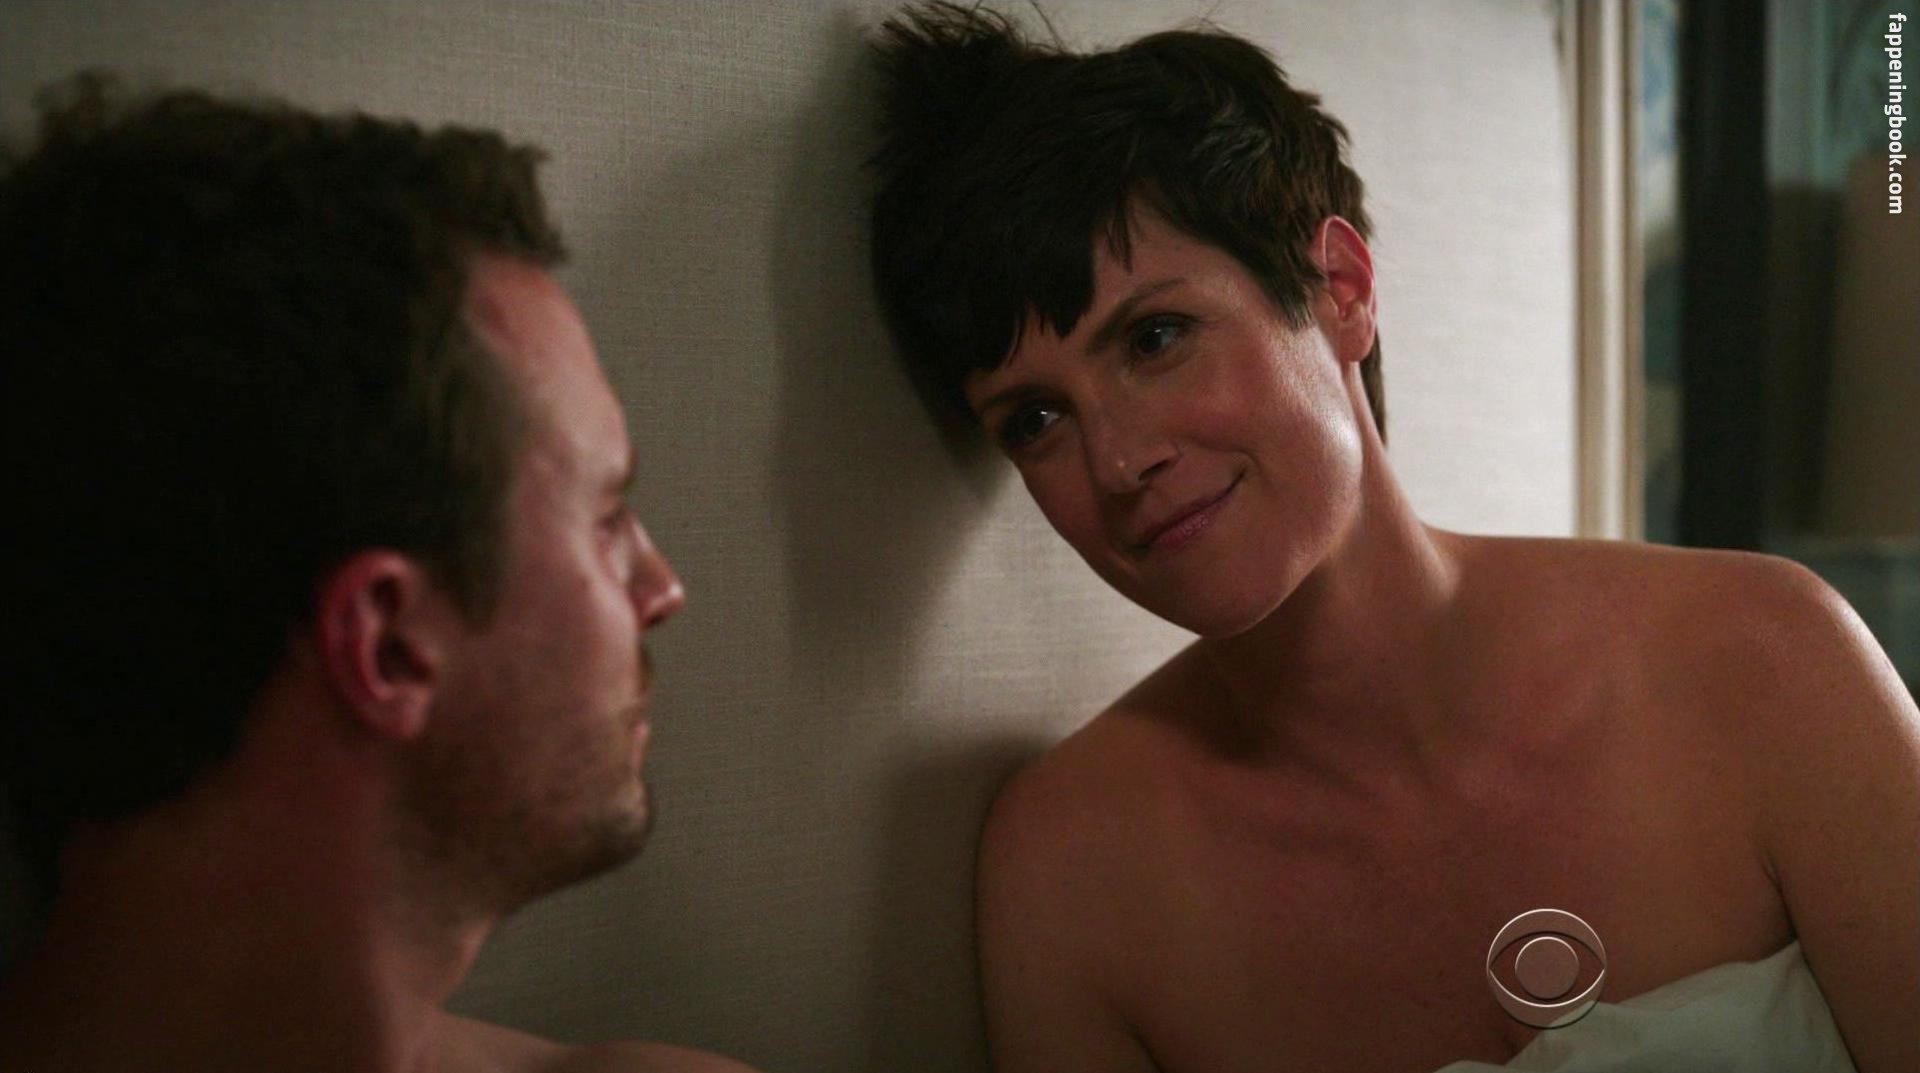 Susan mclellan nude in hot scenes